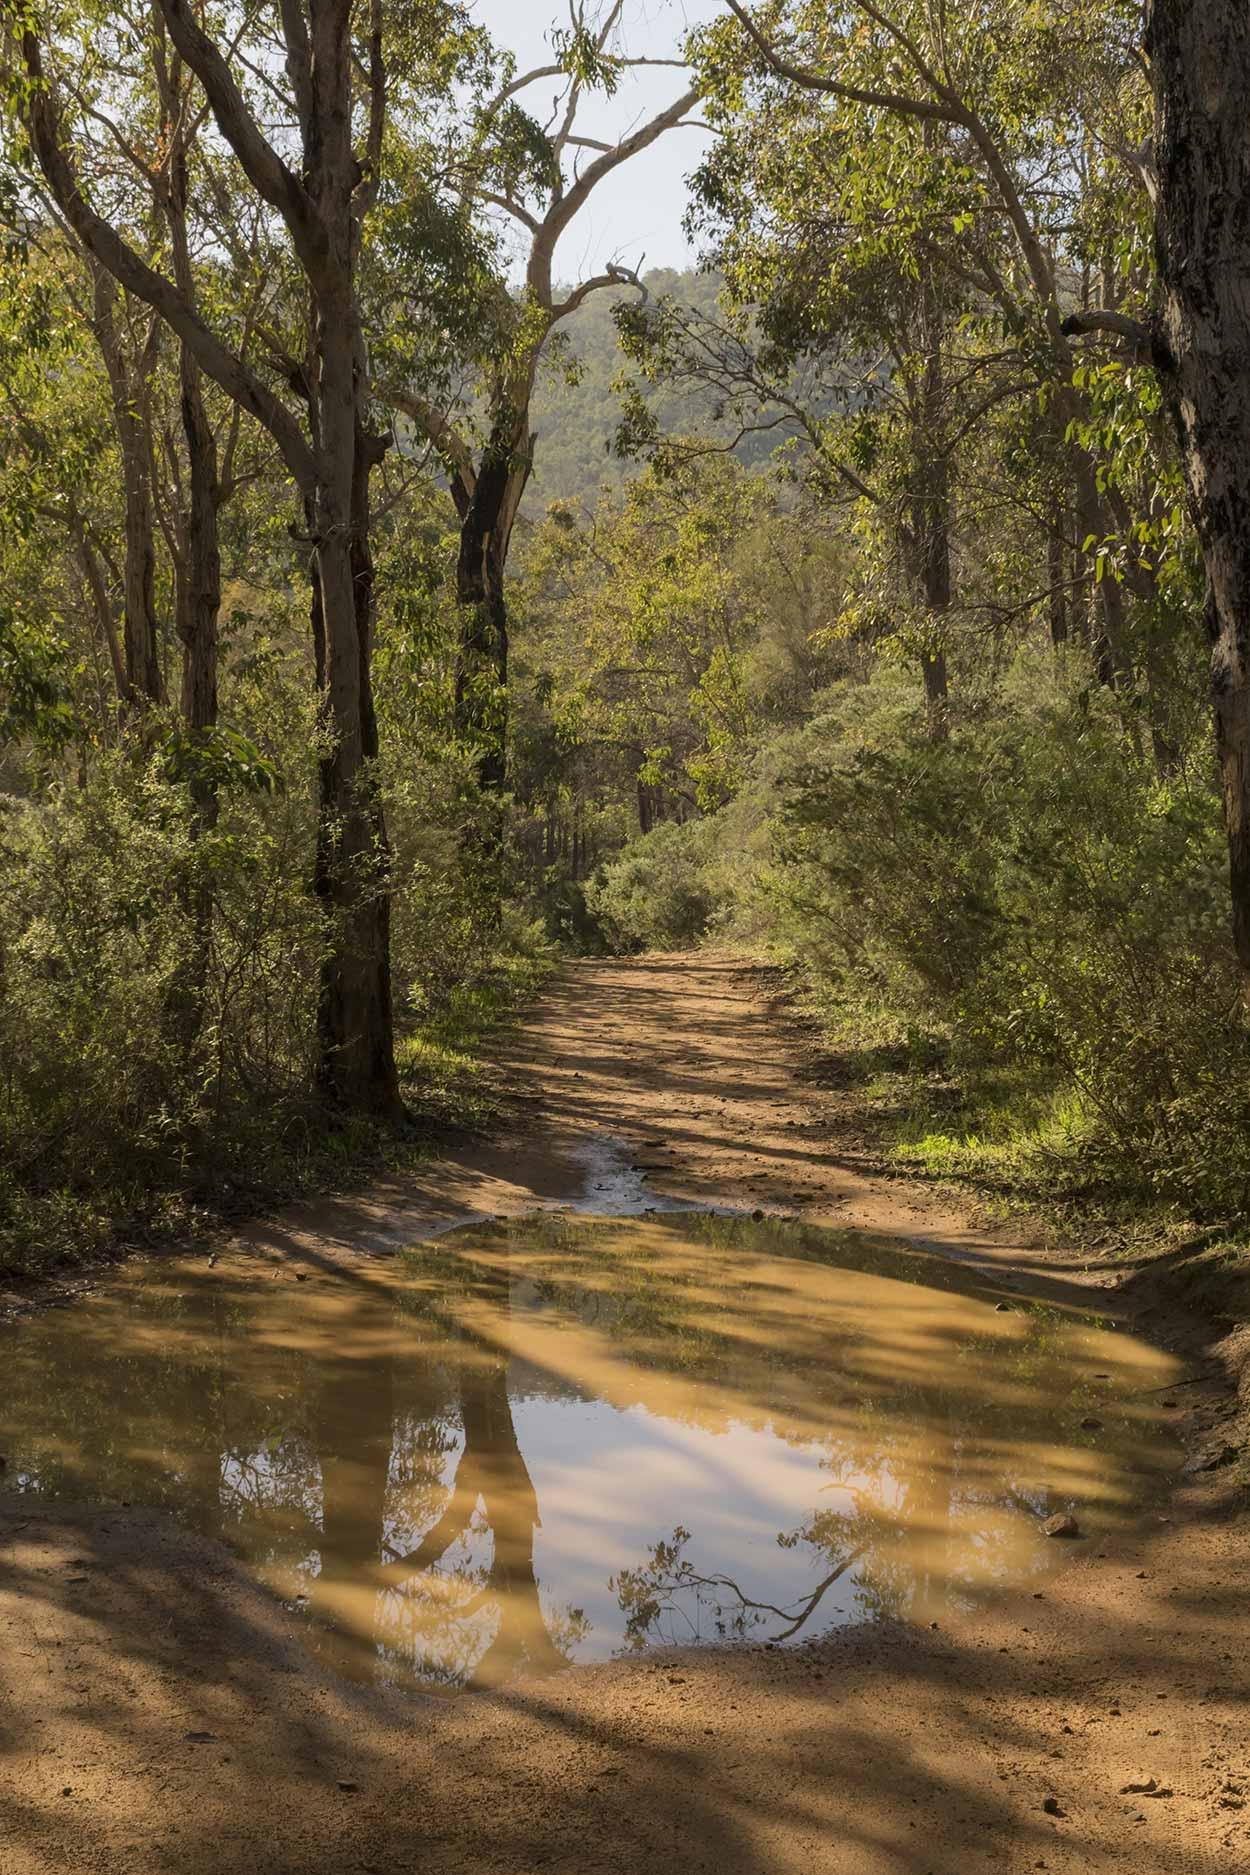 A muddy path in Wungong Gorge, Wungong Regional Park, Perth, Western Australia